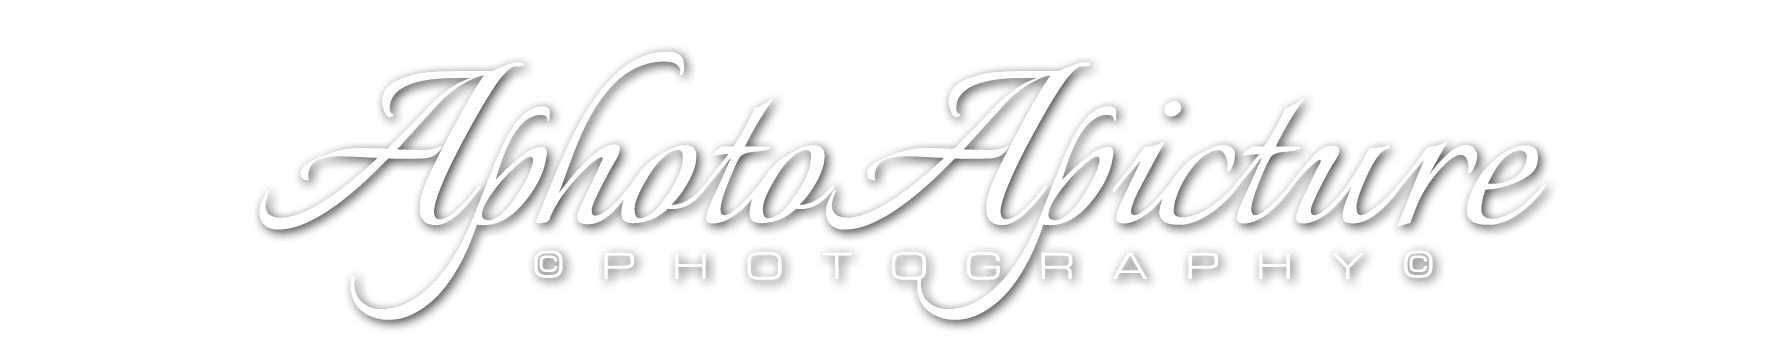 AphotoApicture